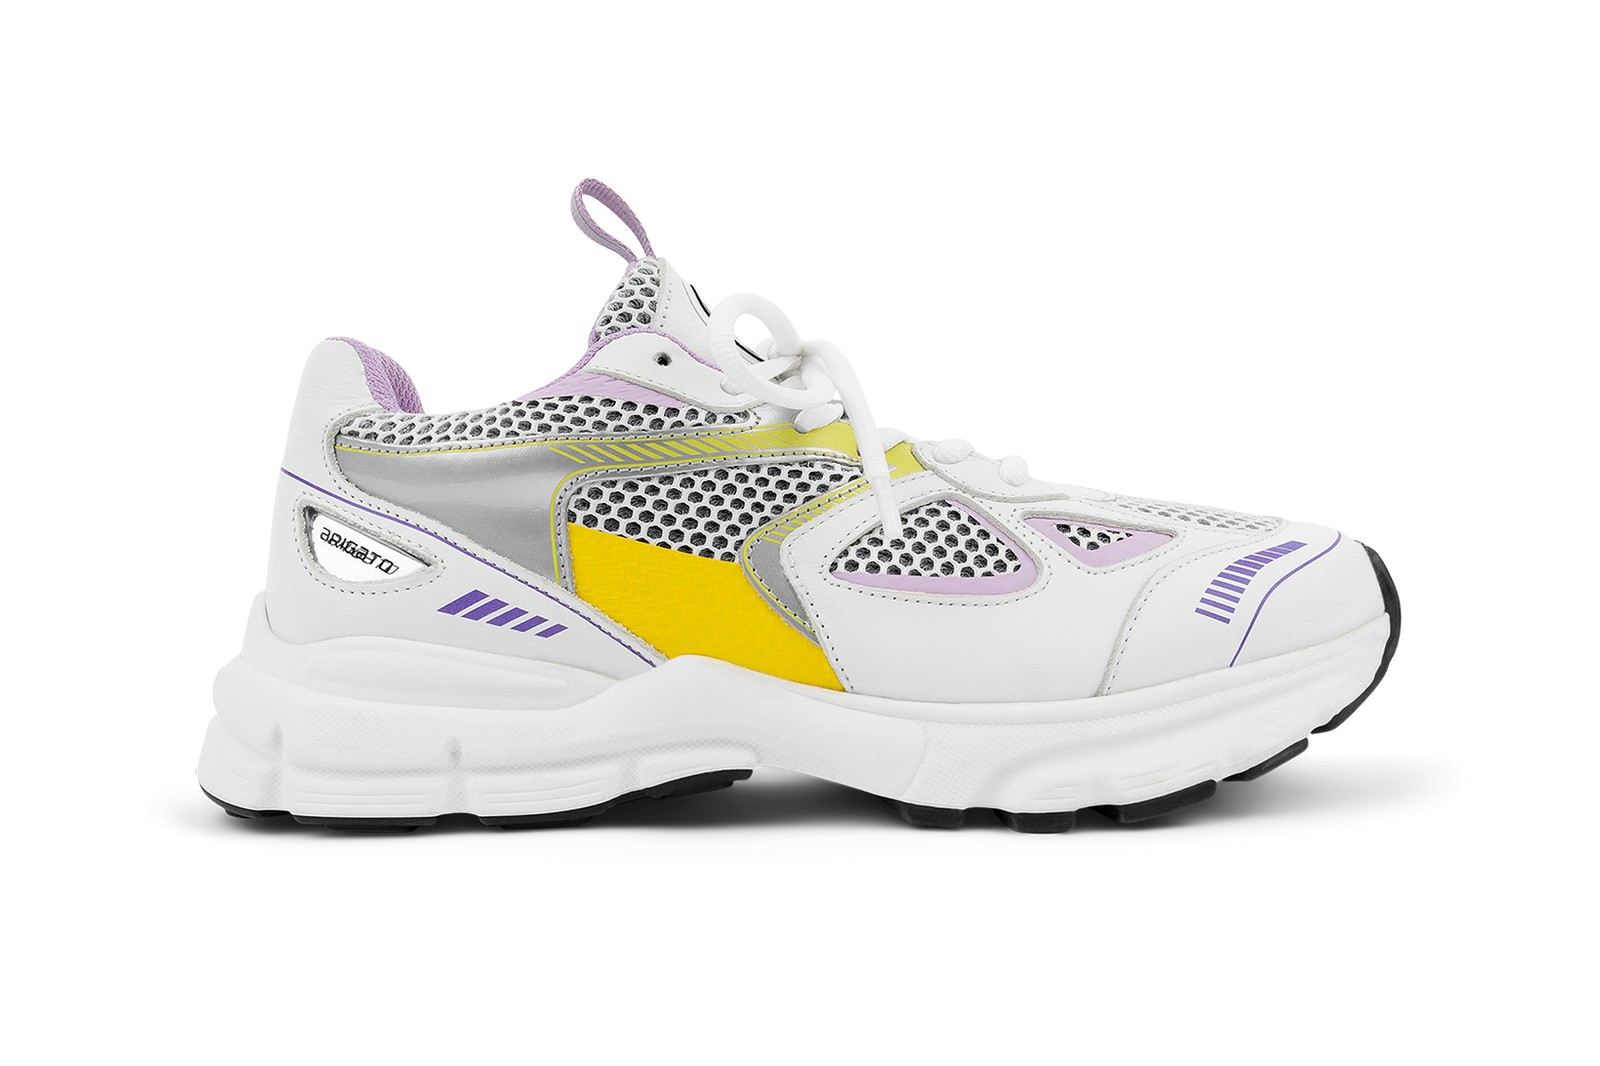 axel arigato marathon runner sneakers white blue purple yellow footwear shoes kicks sneakerhead